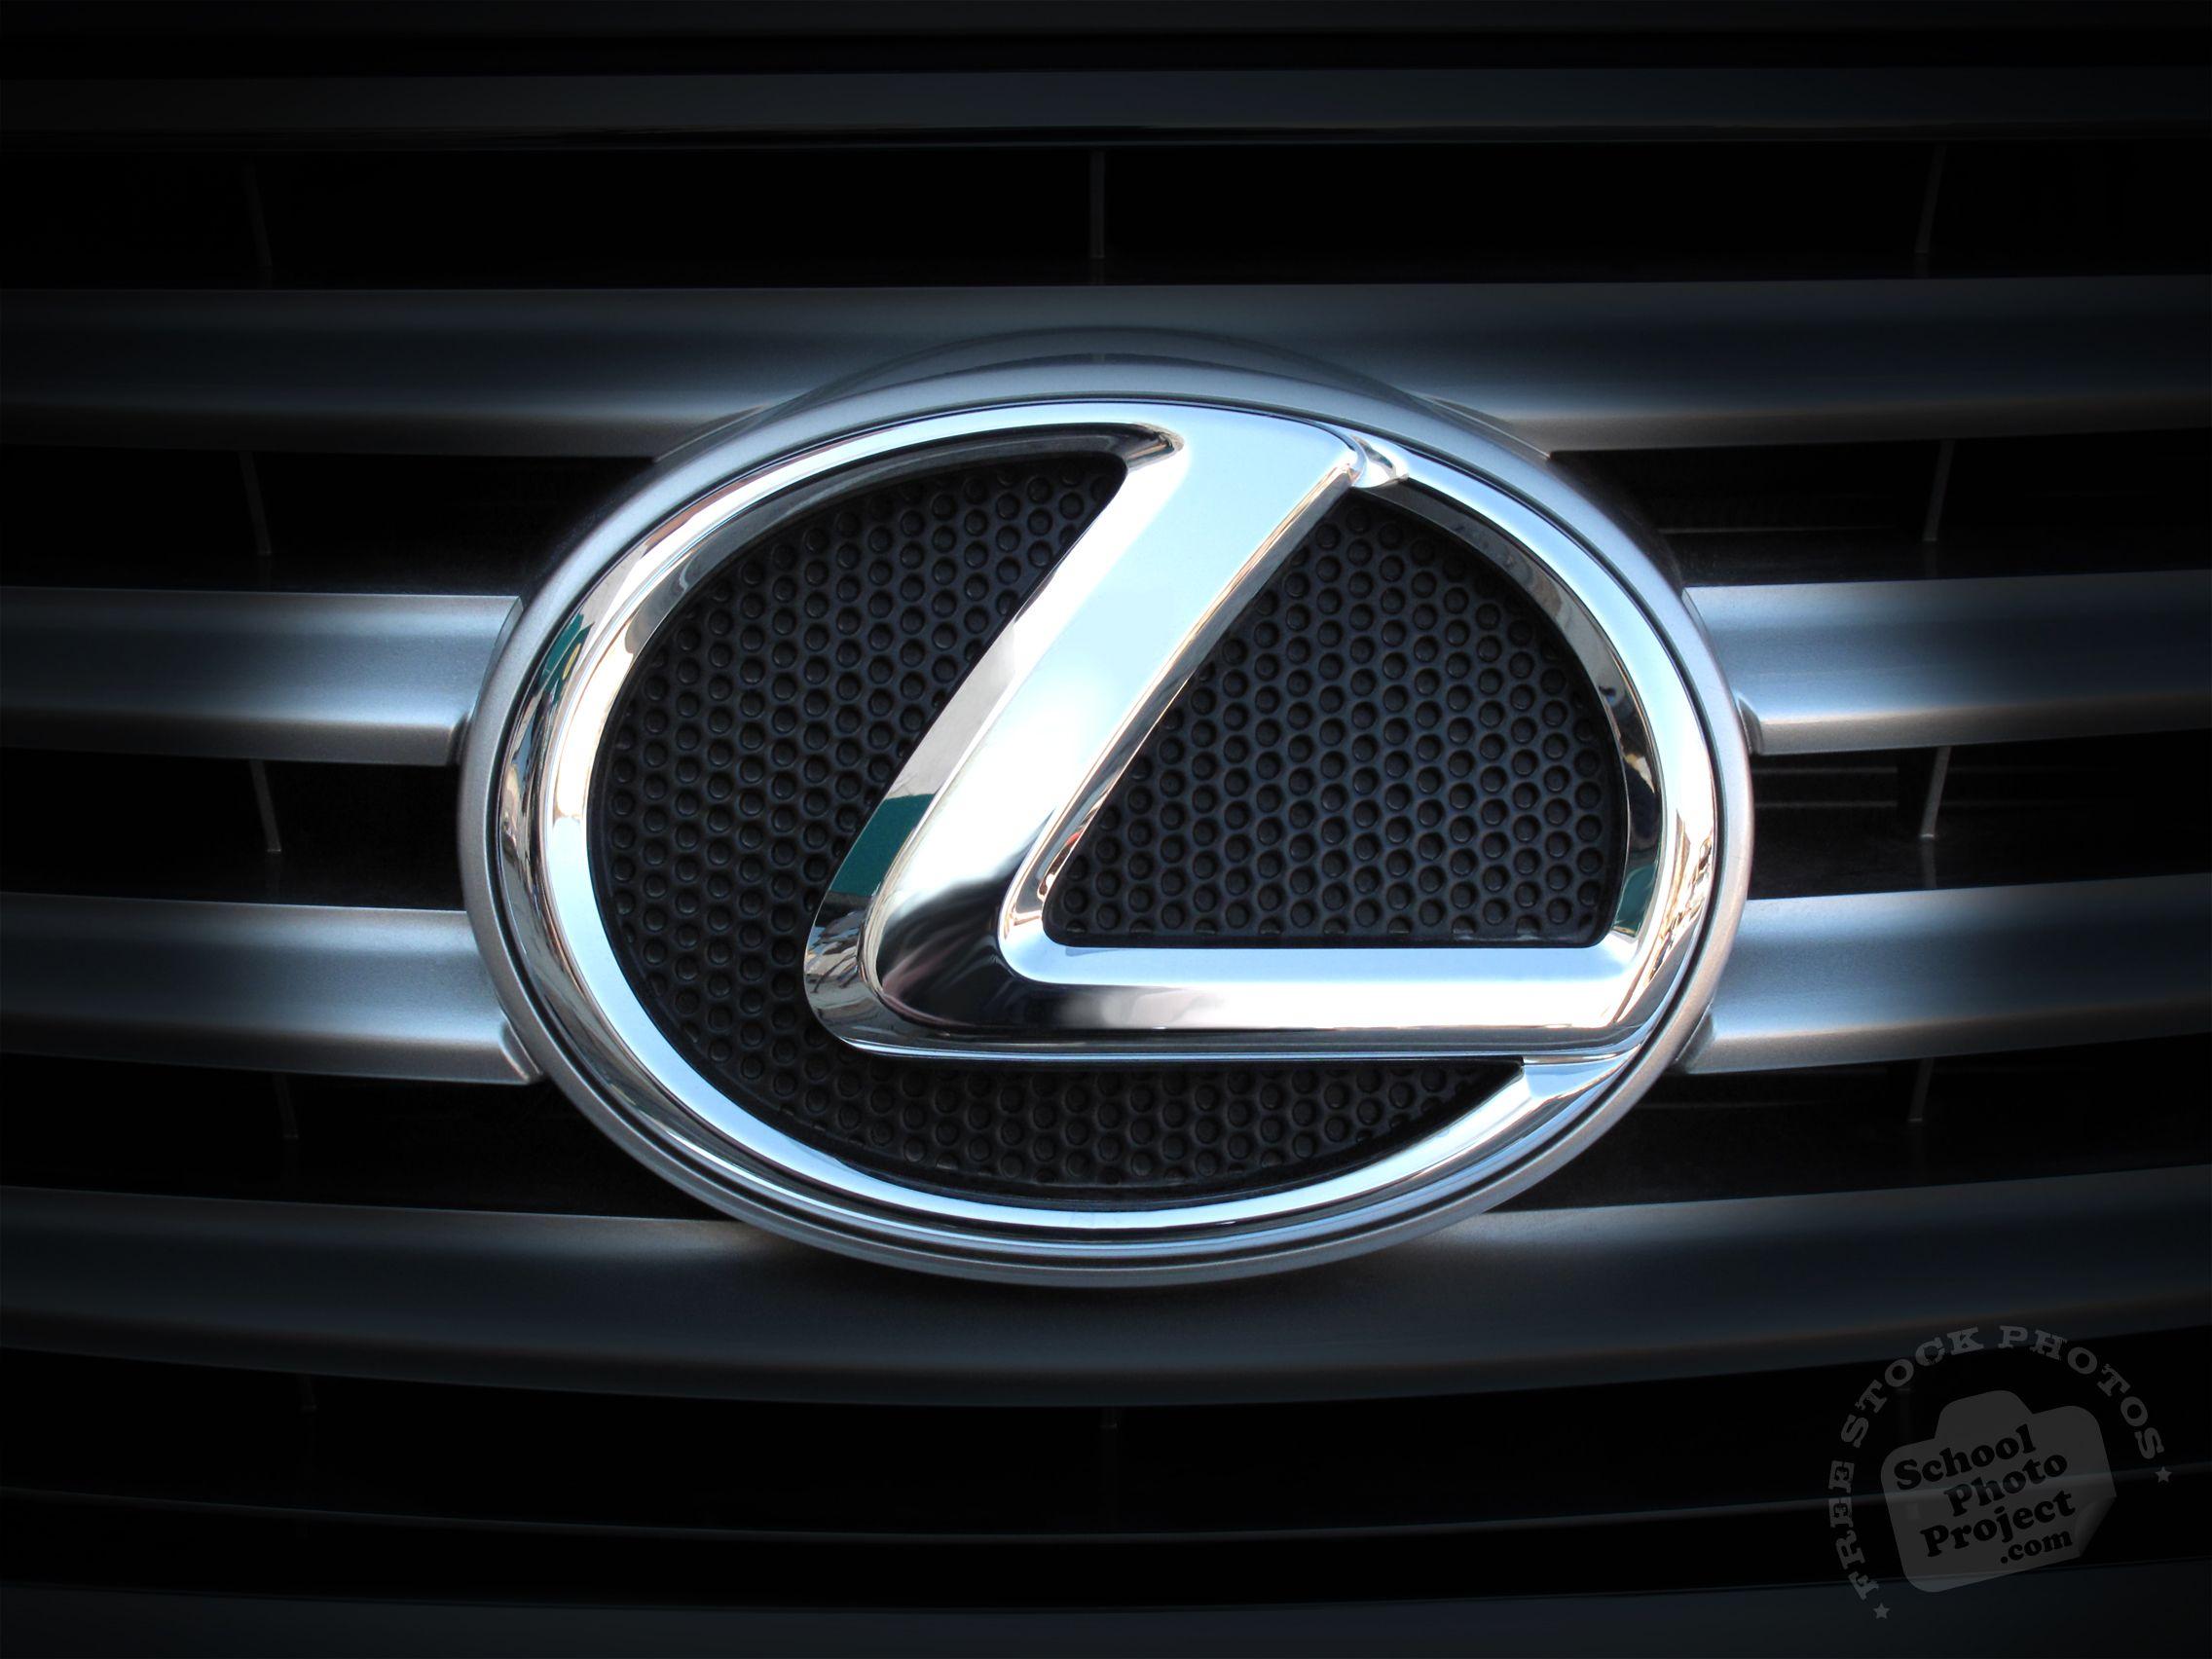 Free Lexus Logo Lexus Car Brand Famous Car Identity Royalty